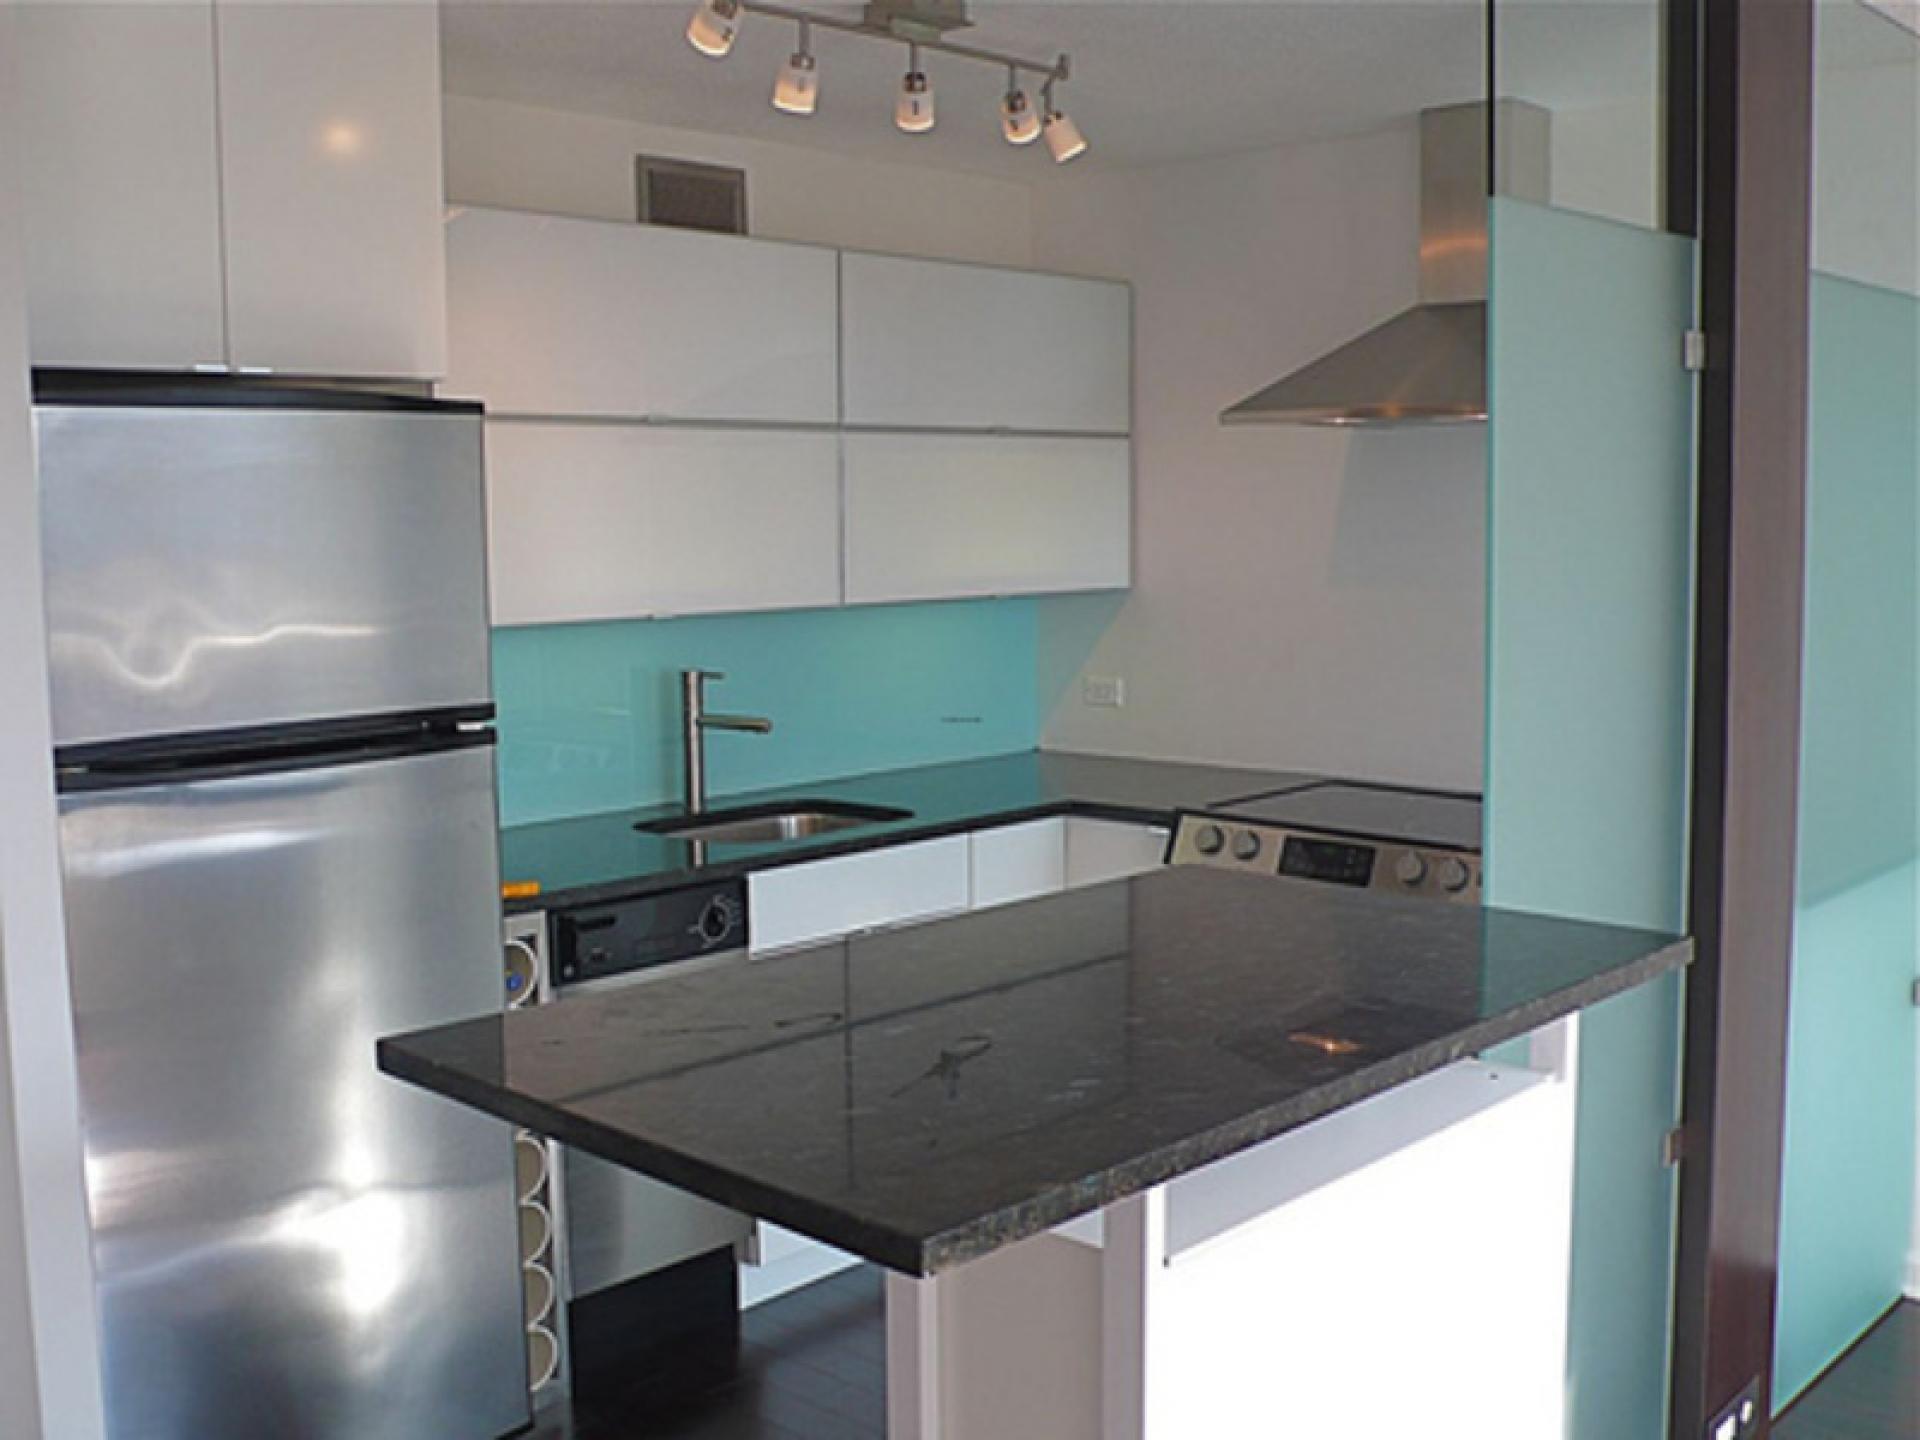 Small Kitchen Interior photo - 9